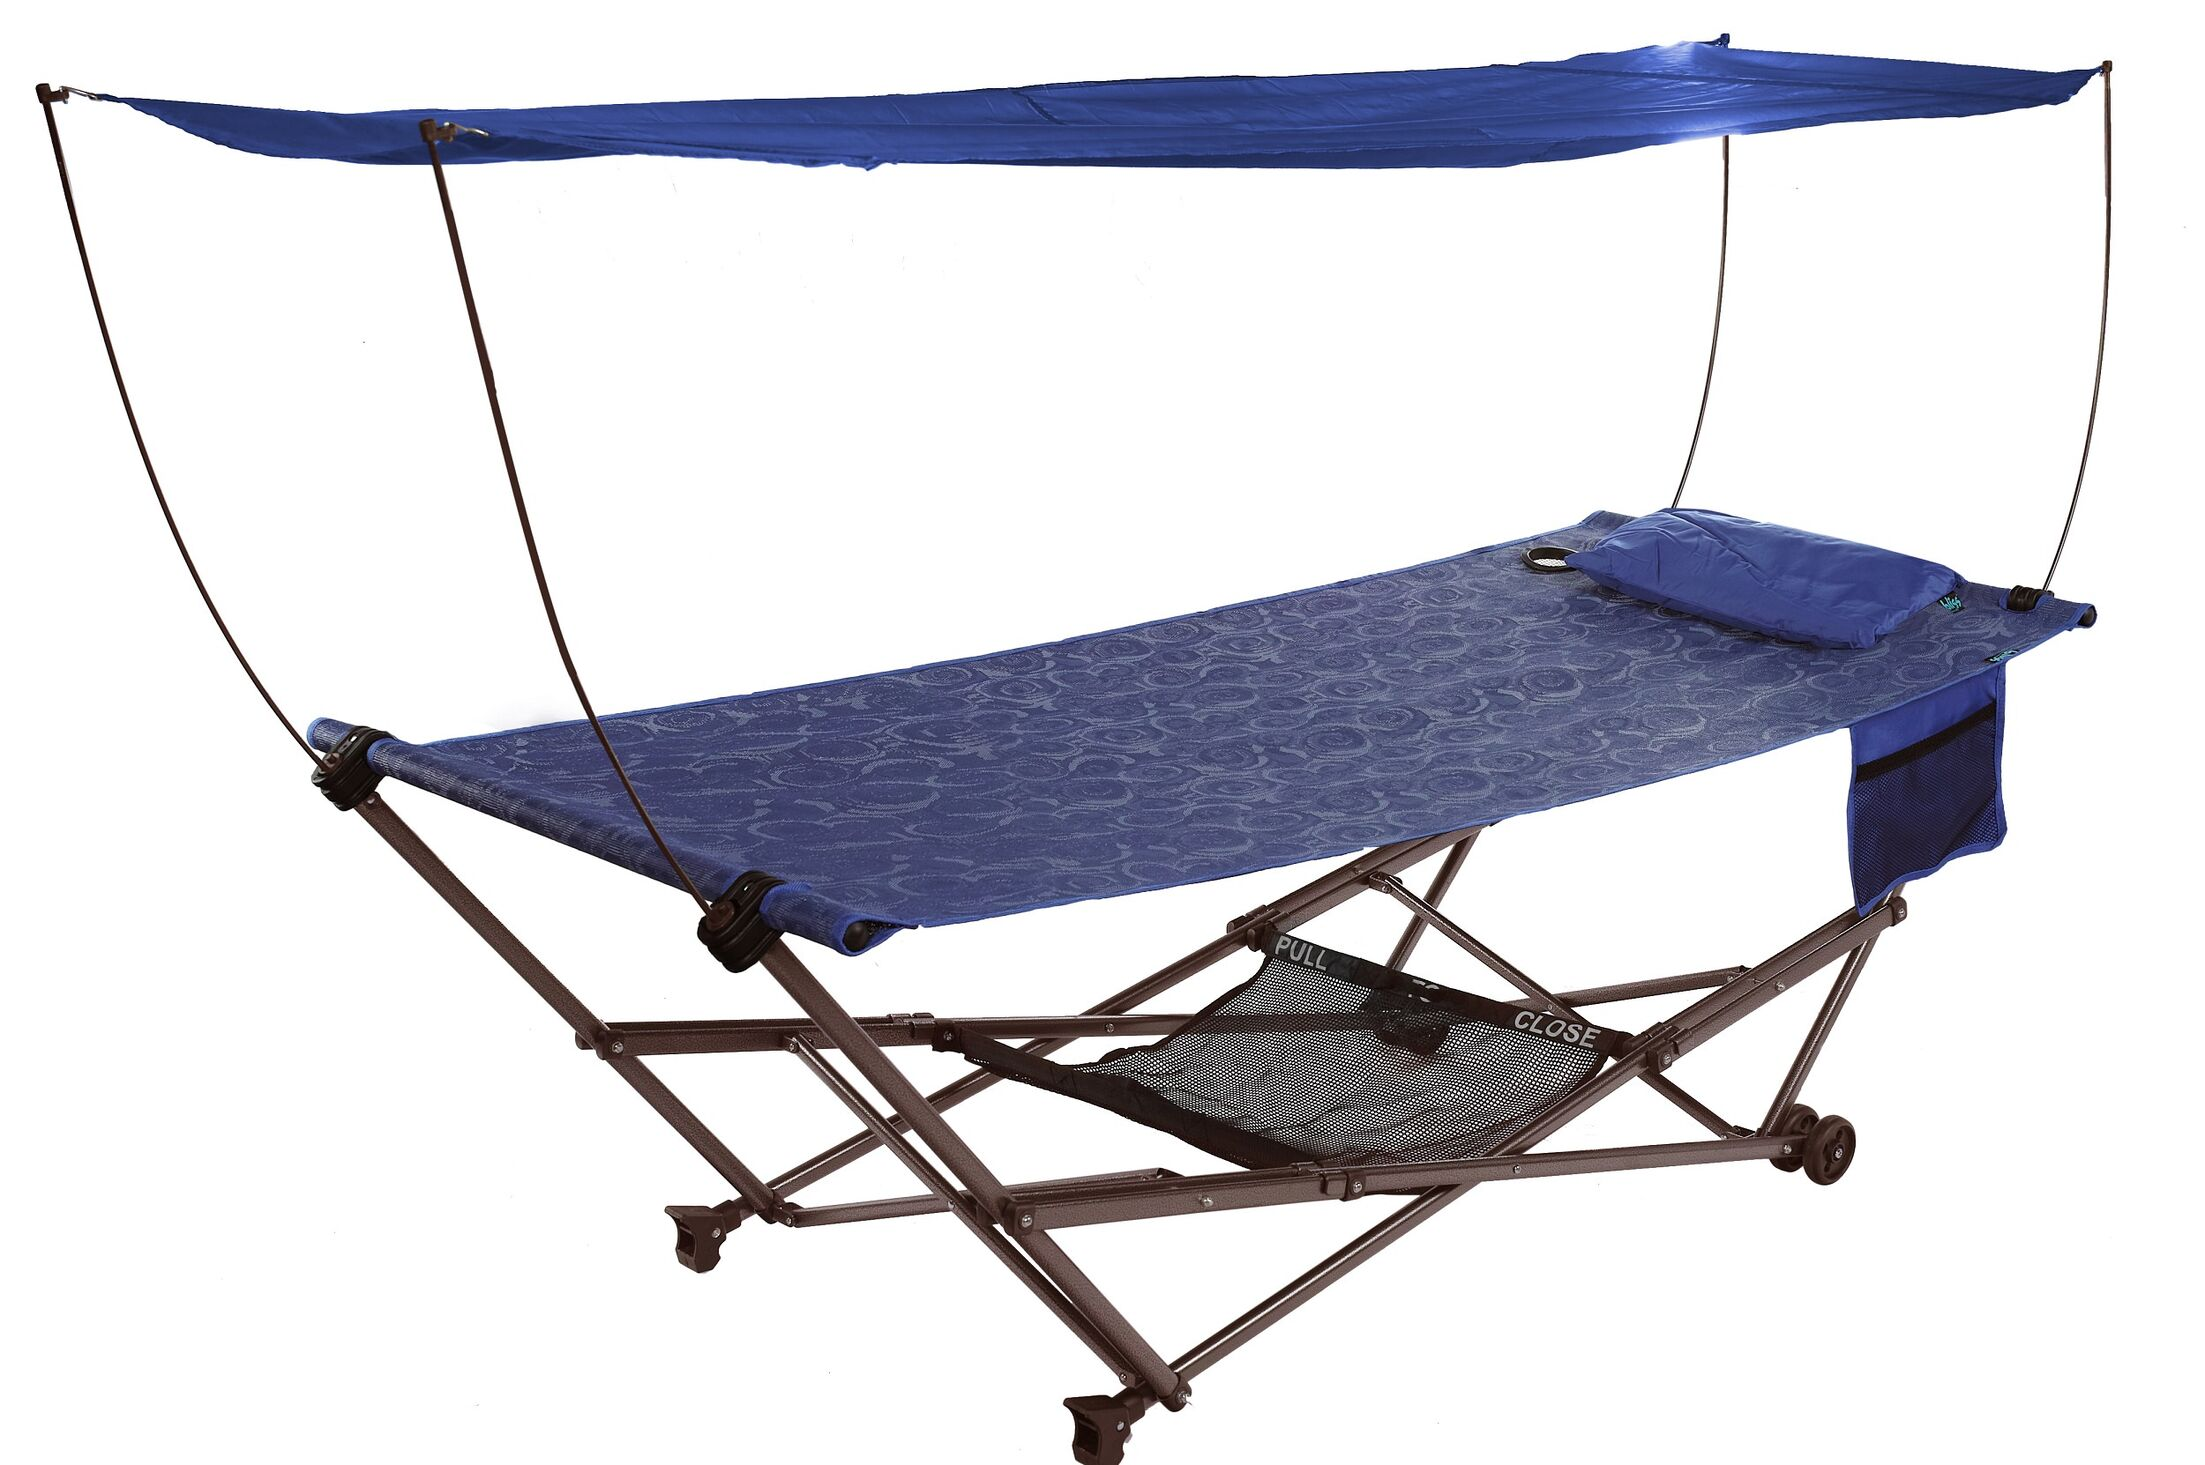 Solis Camping Hammock Color: Blue